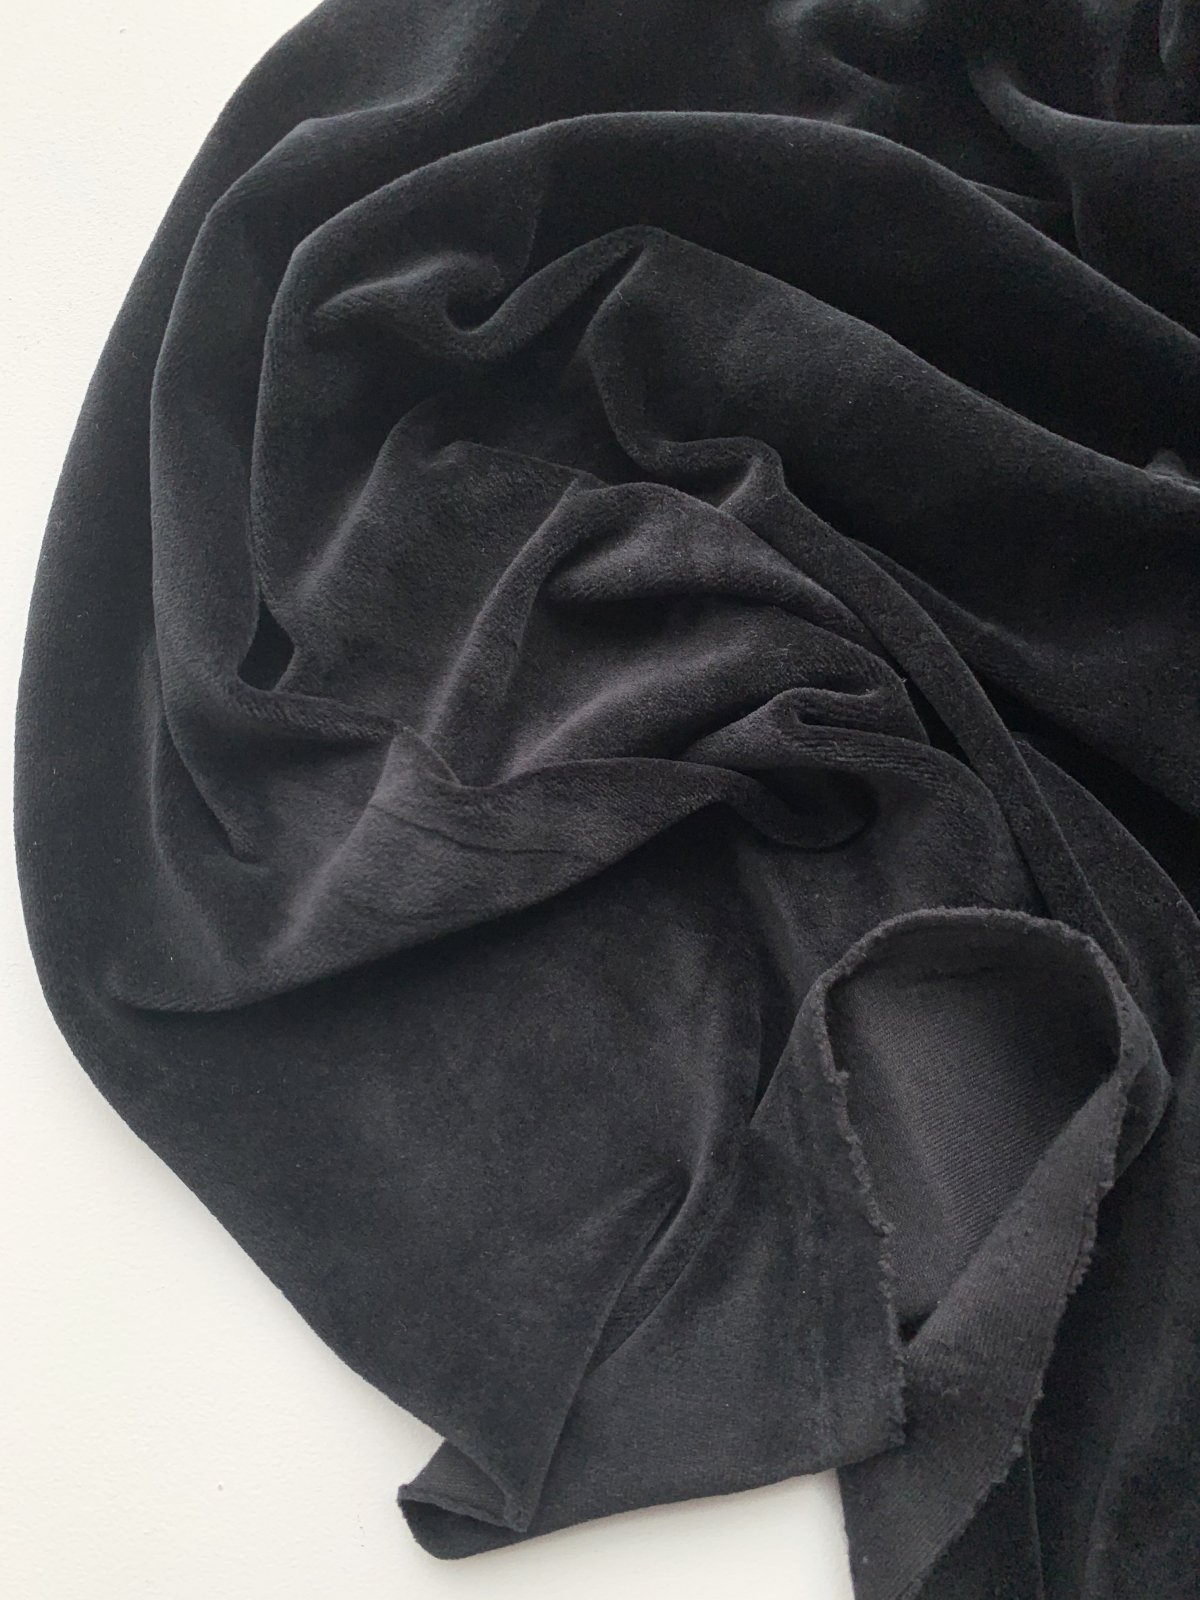 Velour Knit - Black 62